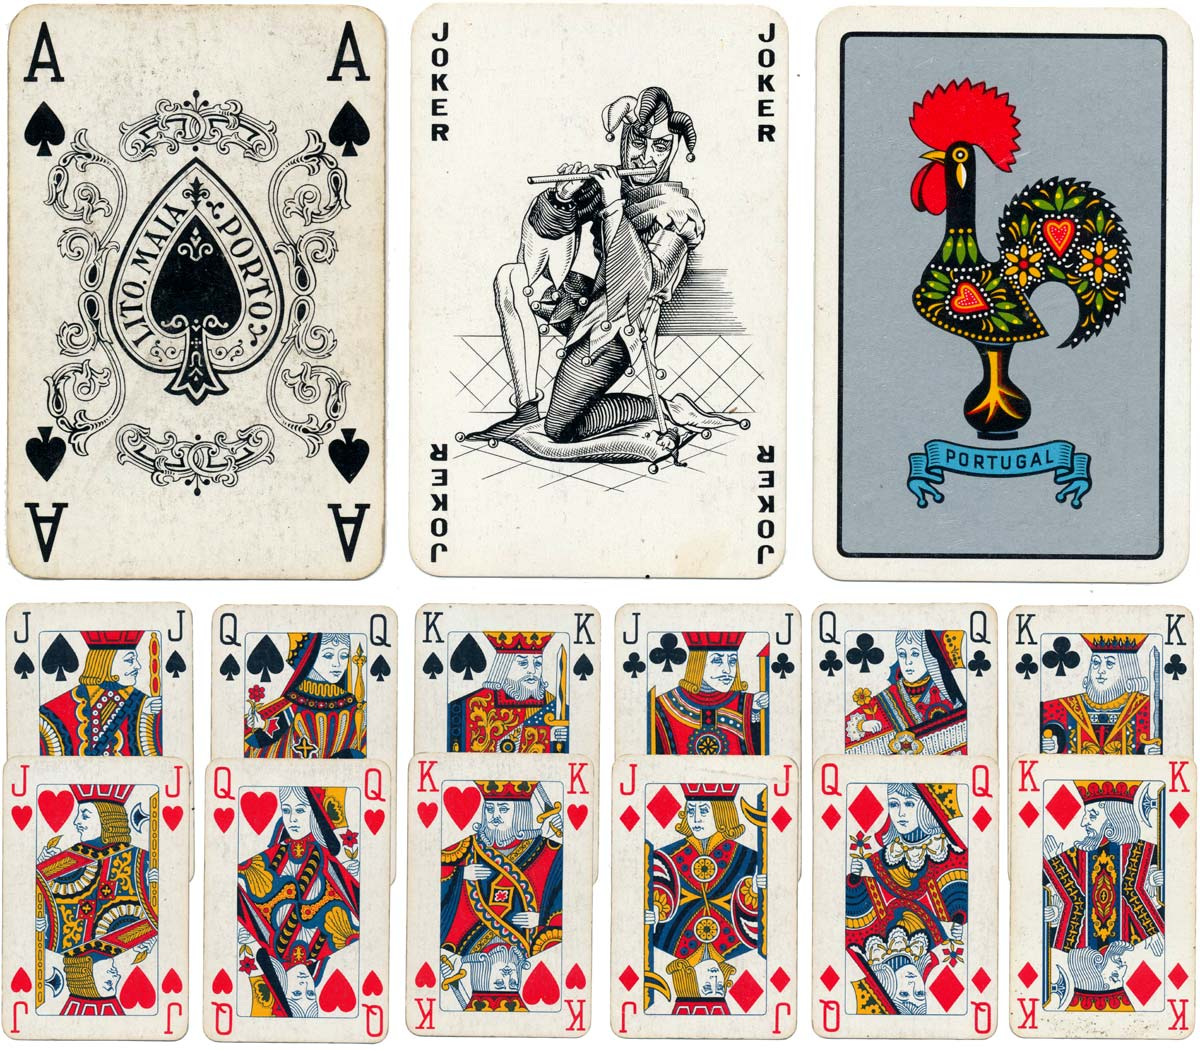 MA Beato Justero Rodrigo Costa Valerio JJ Nunes And Litografia Maia Card Making In Portugal Today Has Lost A Lot Of Its Former Glory Is